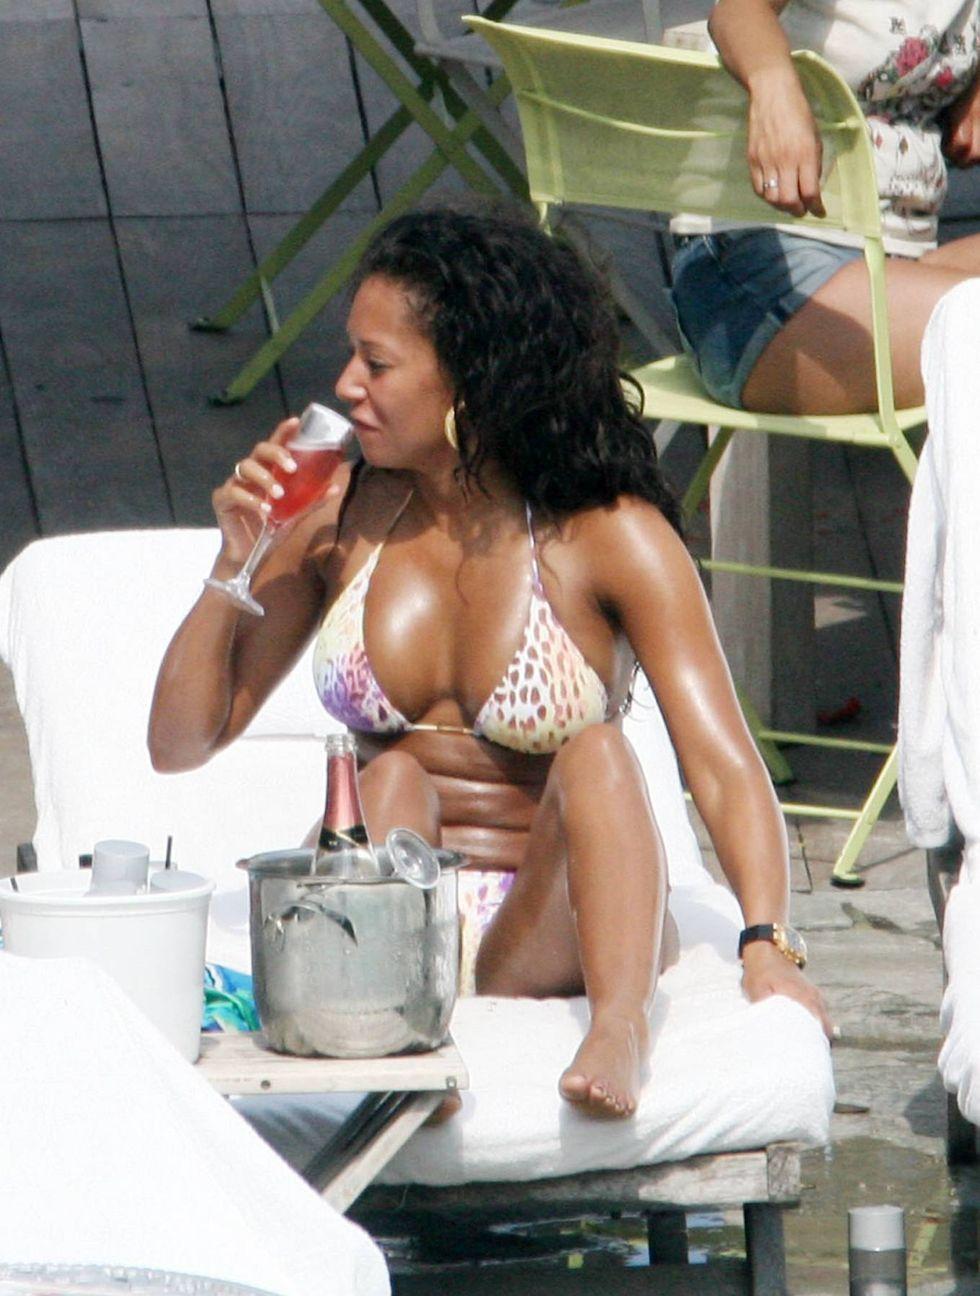 melanie-brown-in-bikini-by-the-pool-in-miami-02